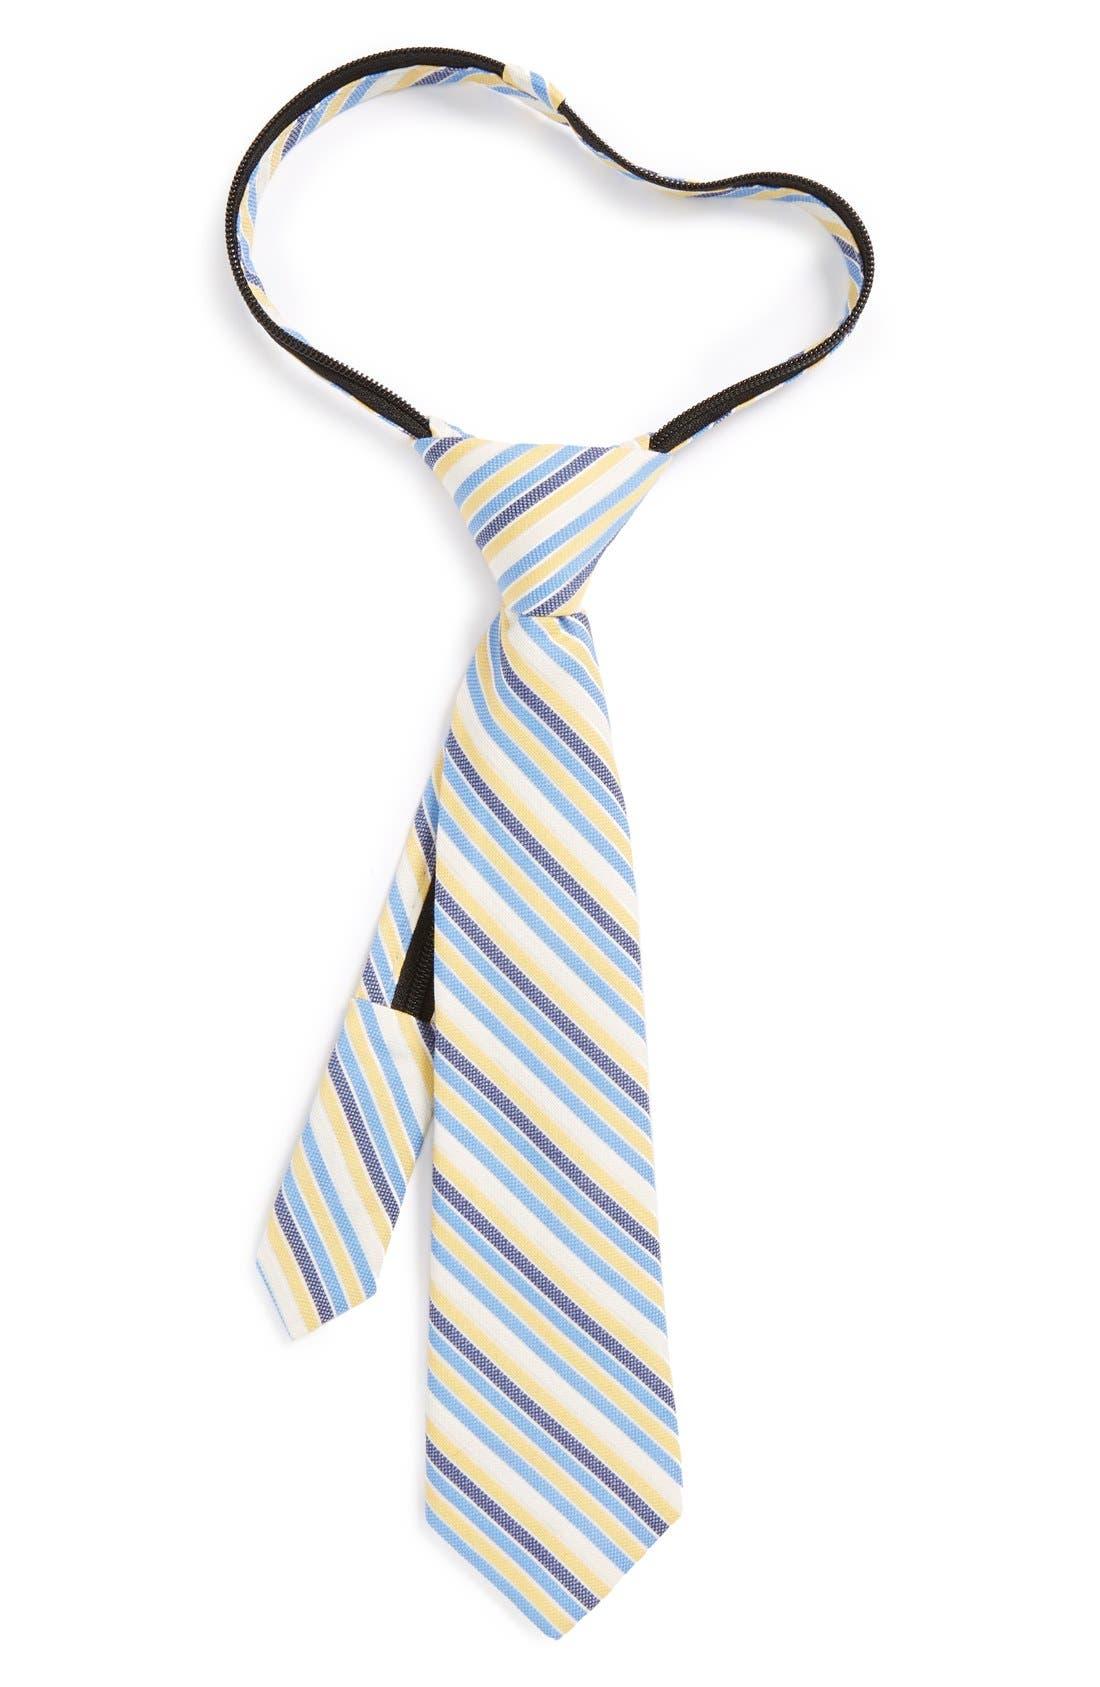 Alternate Image 1 Selected - Nordstrom Cotton & Silk Zipper Tie (Little Boys)